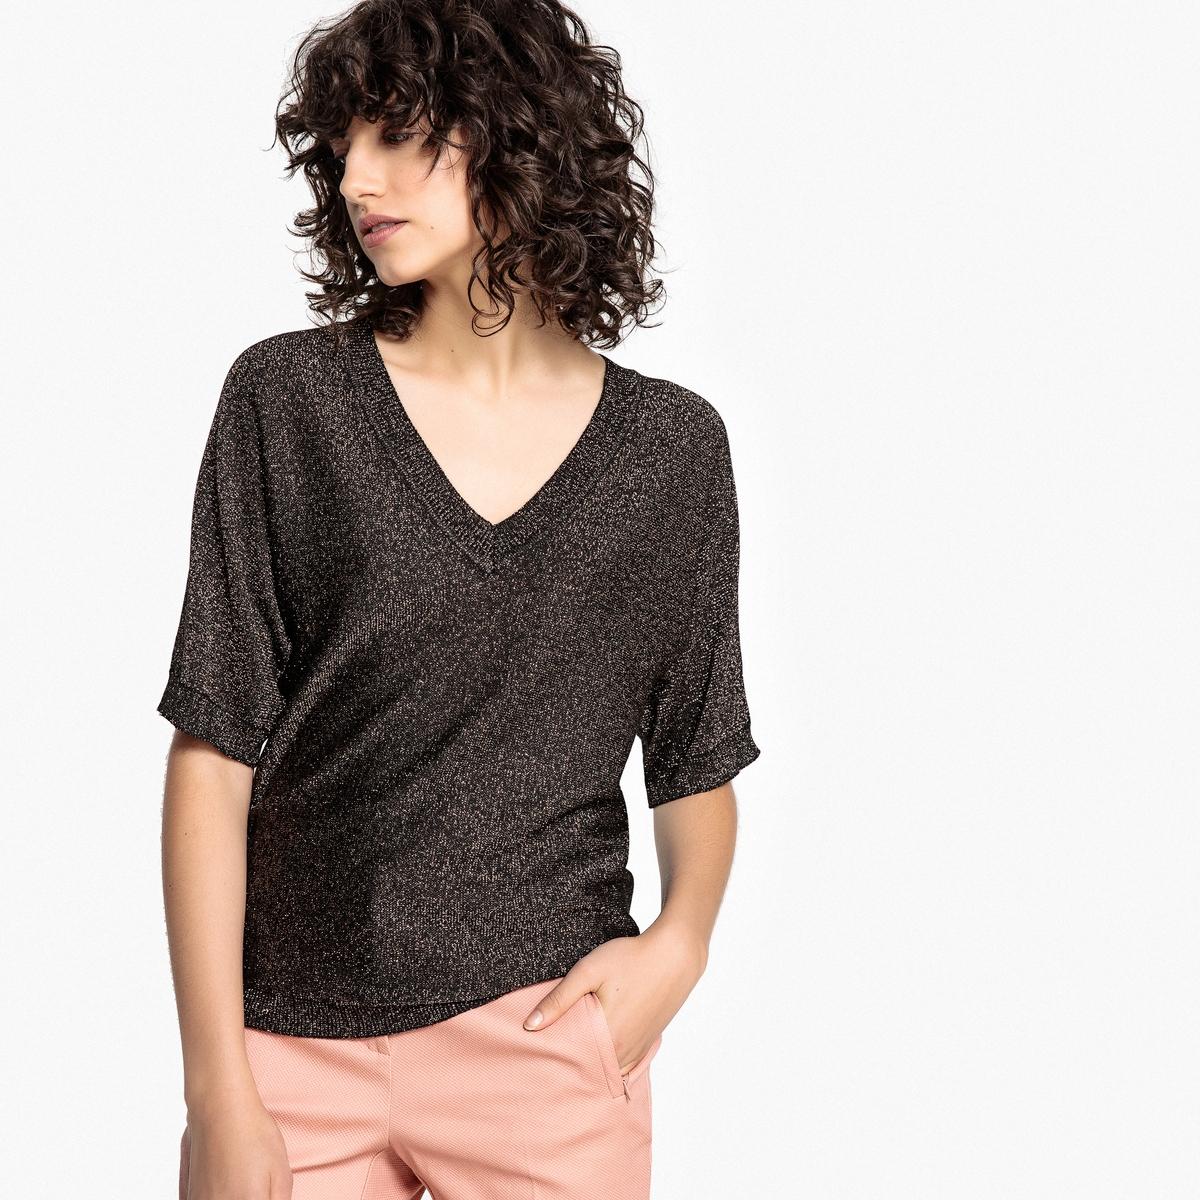 Пуловер из тонкого трикотажа, блестящий